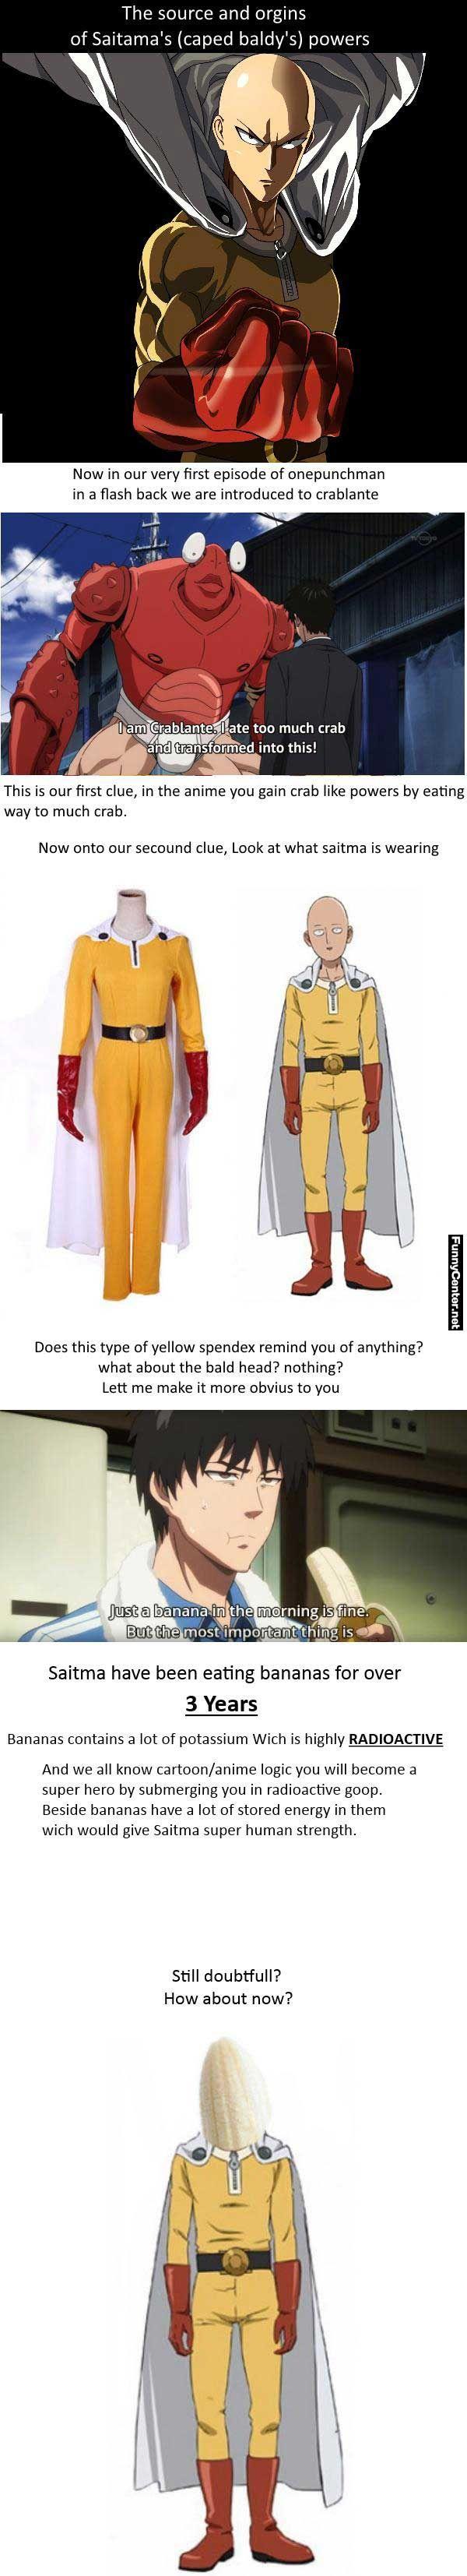 Secret Of Saitama's Powers - One Punch Man